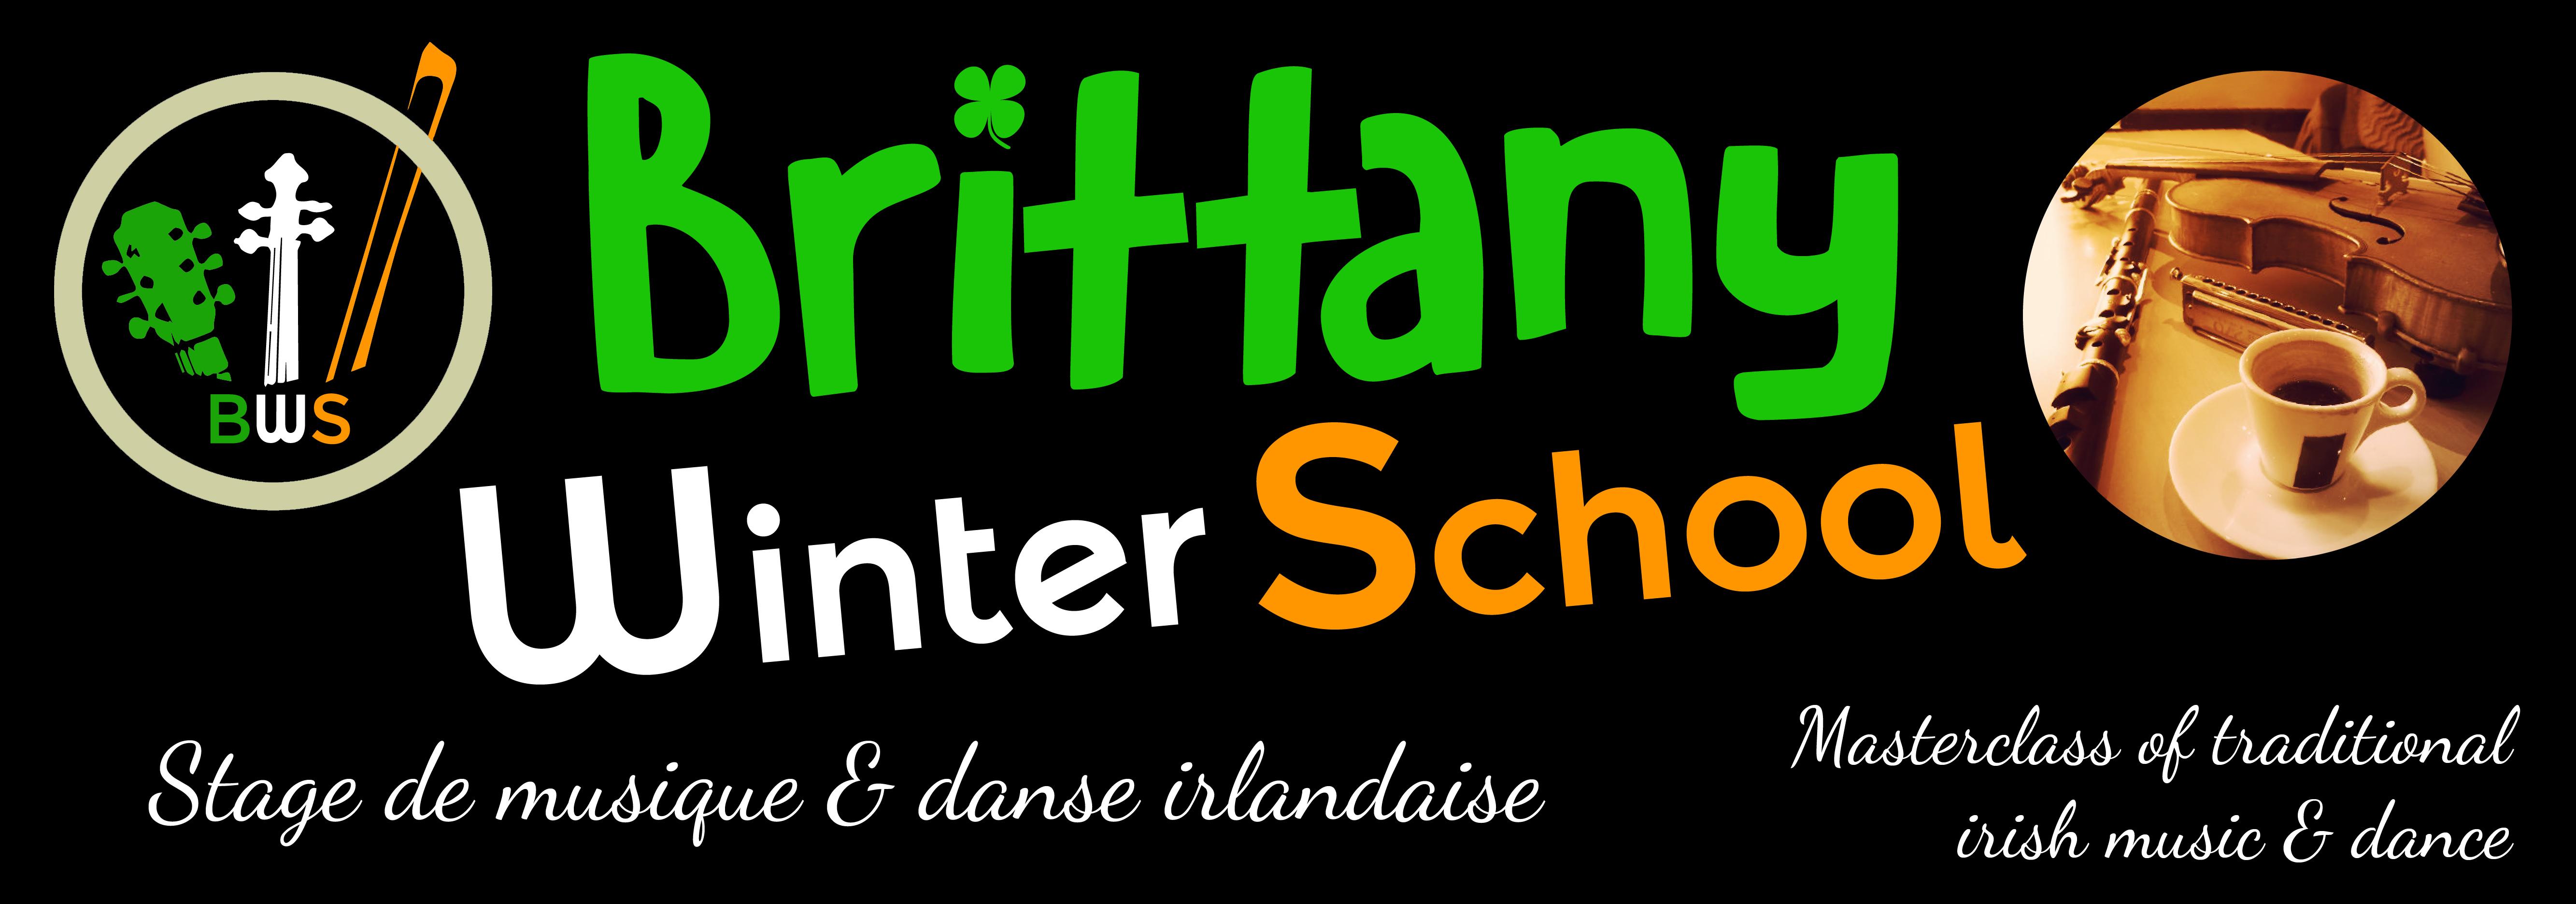 Brittany Winter School - [SITE OFFICIEL] Logo